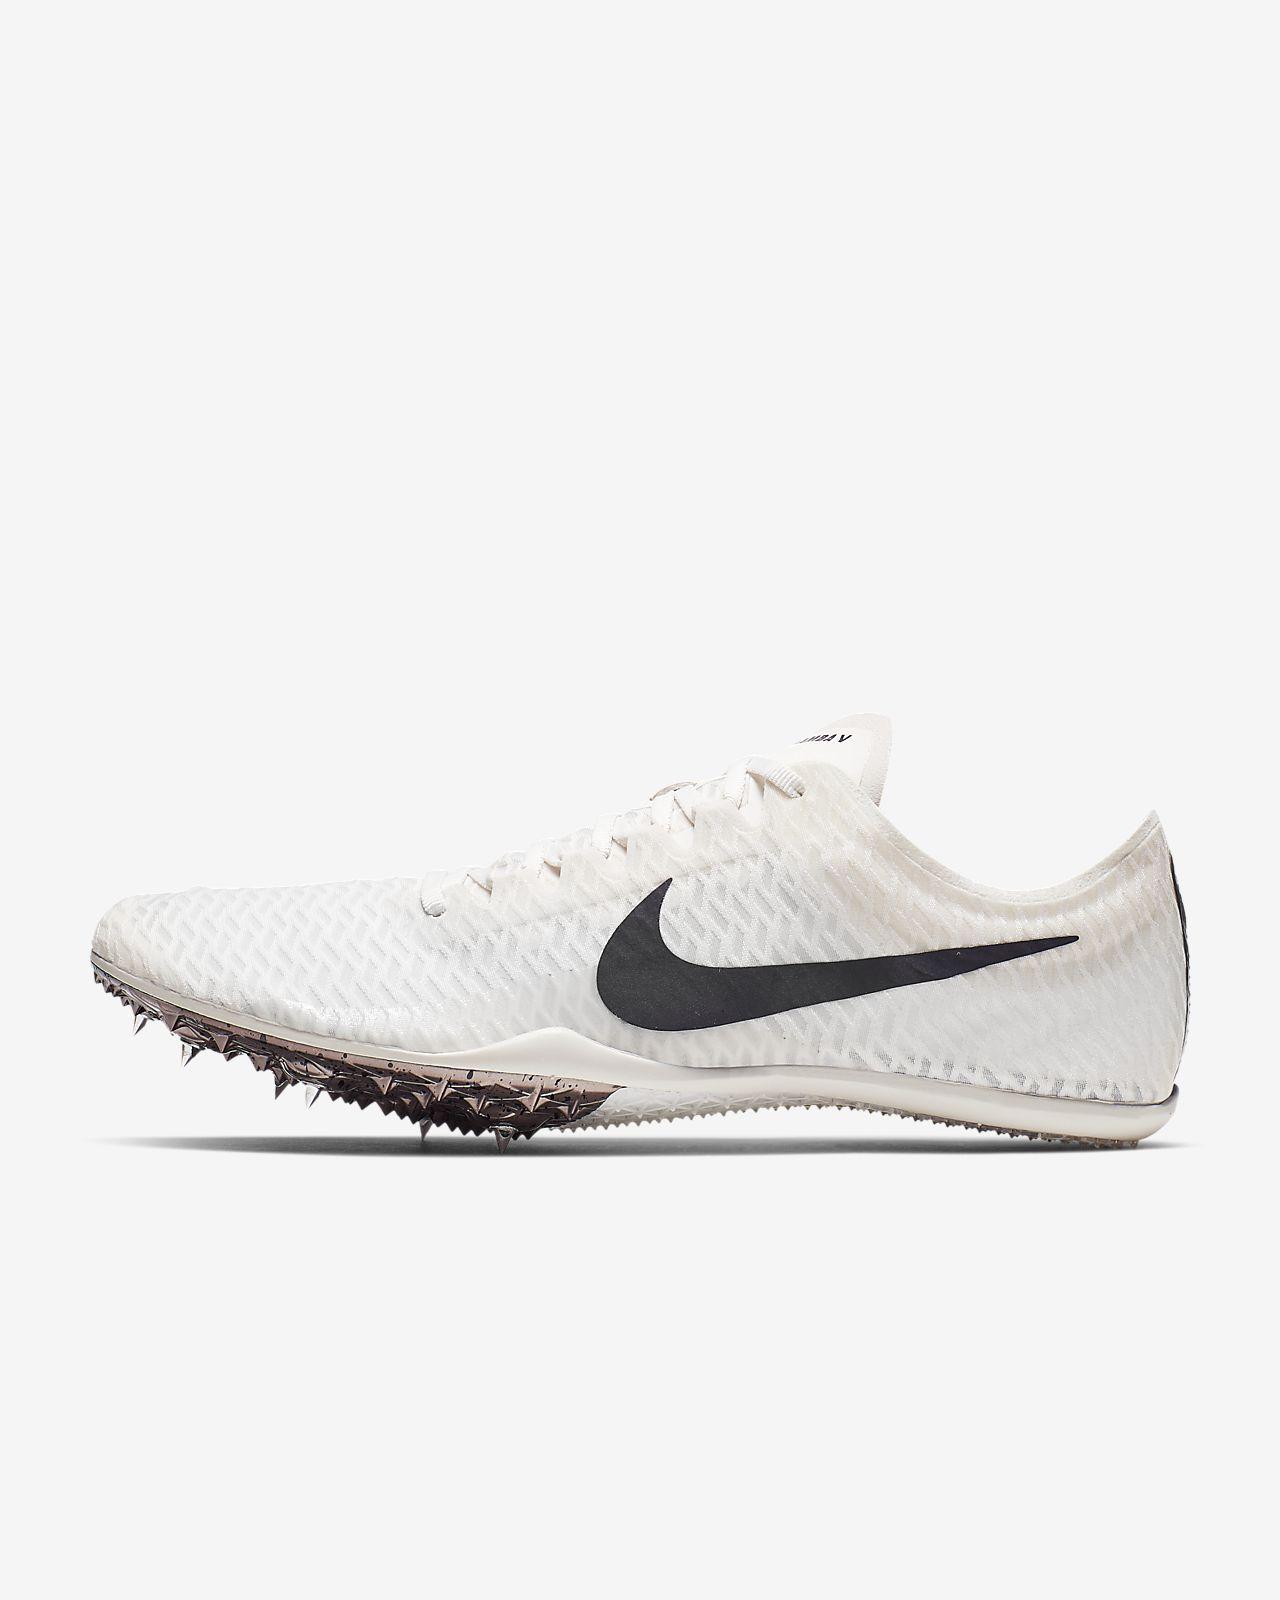 28baf956 Беговые кроссовки Nike Zoom Mamba 5. Nike.com RU